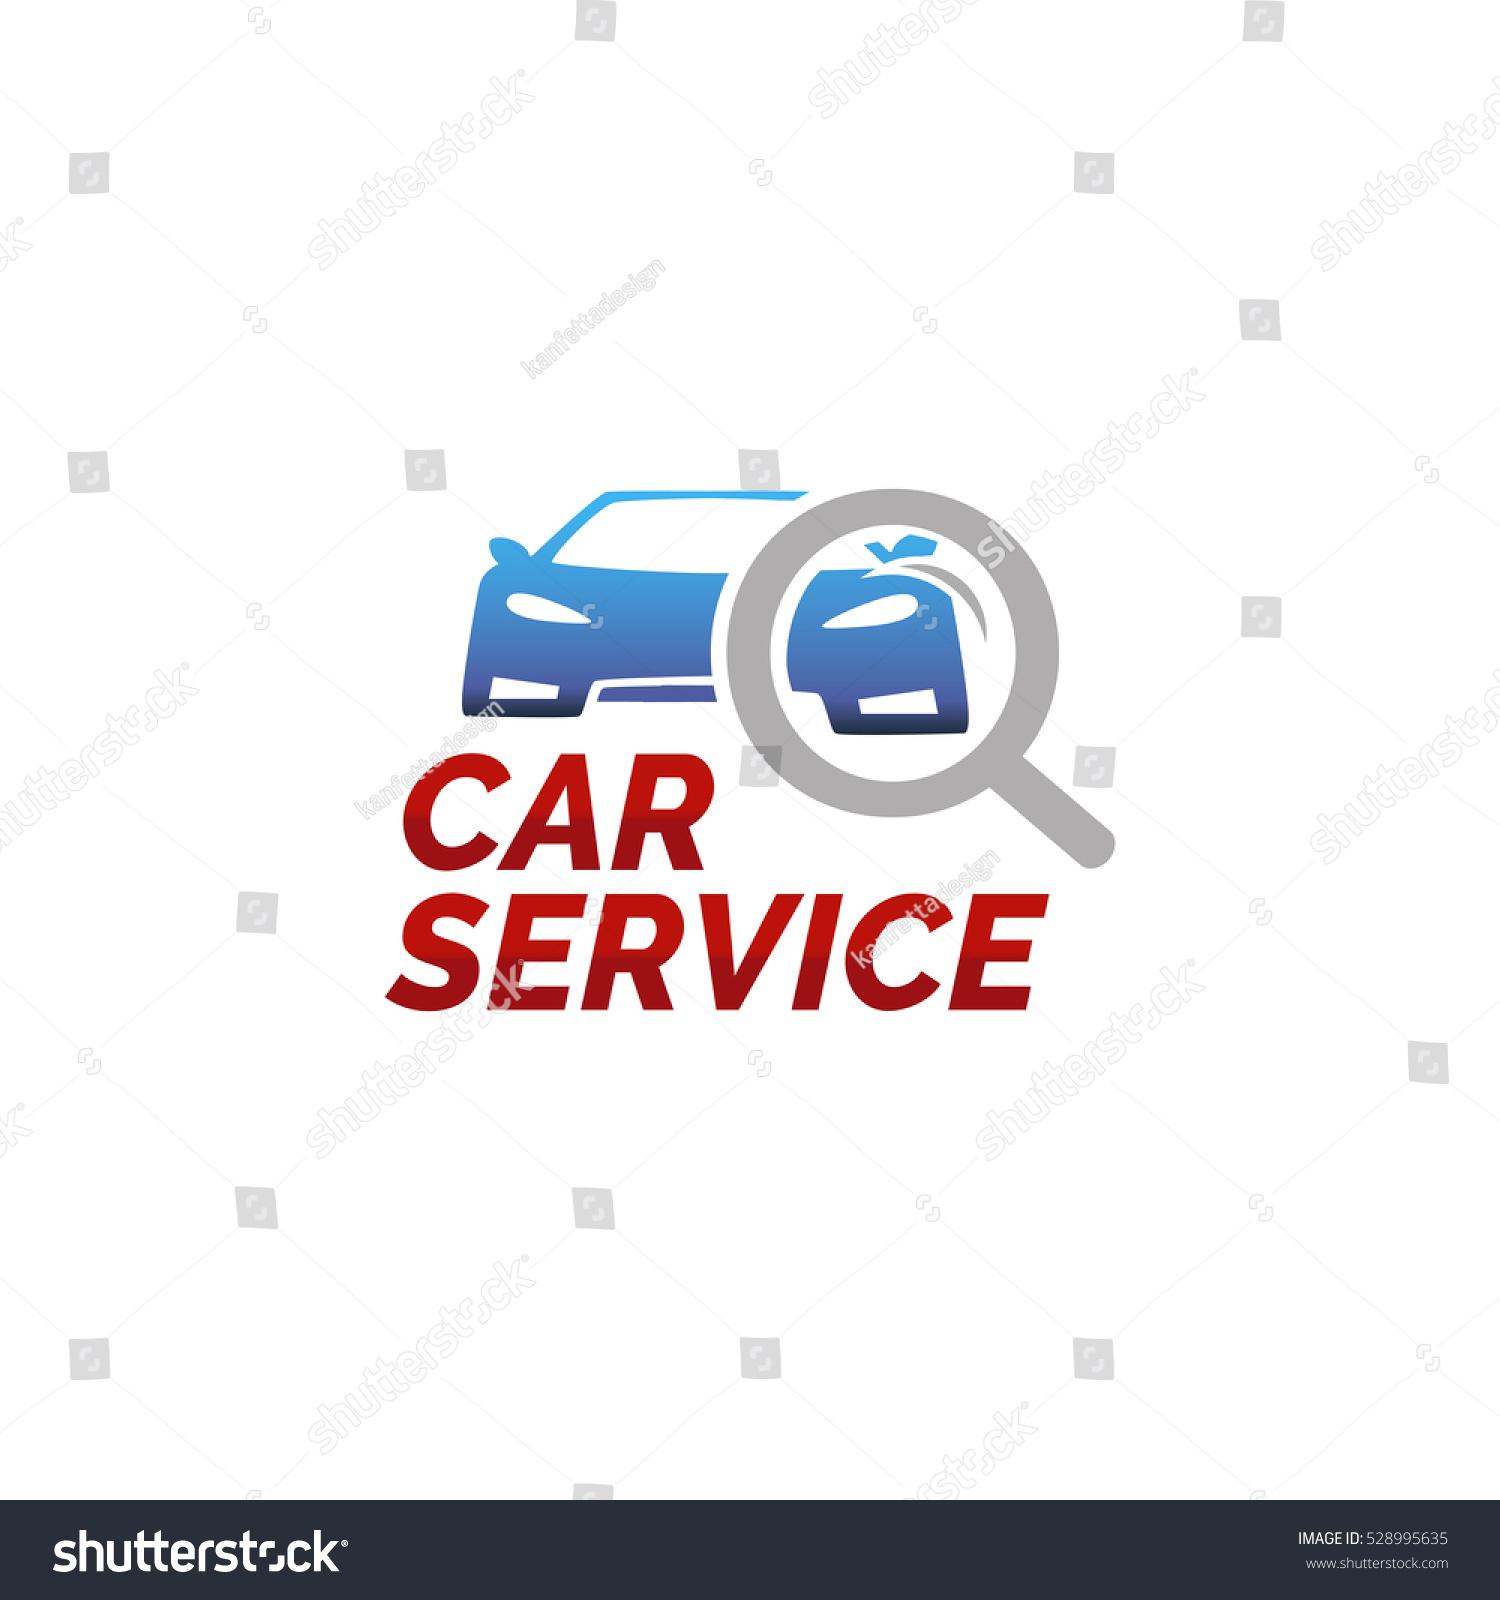 vector logo template car service car stock vector 528995635 rh shutterstock com auto repair logo templates free